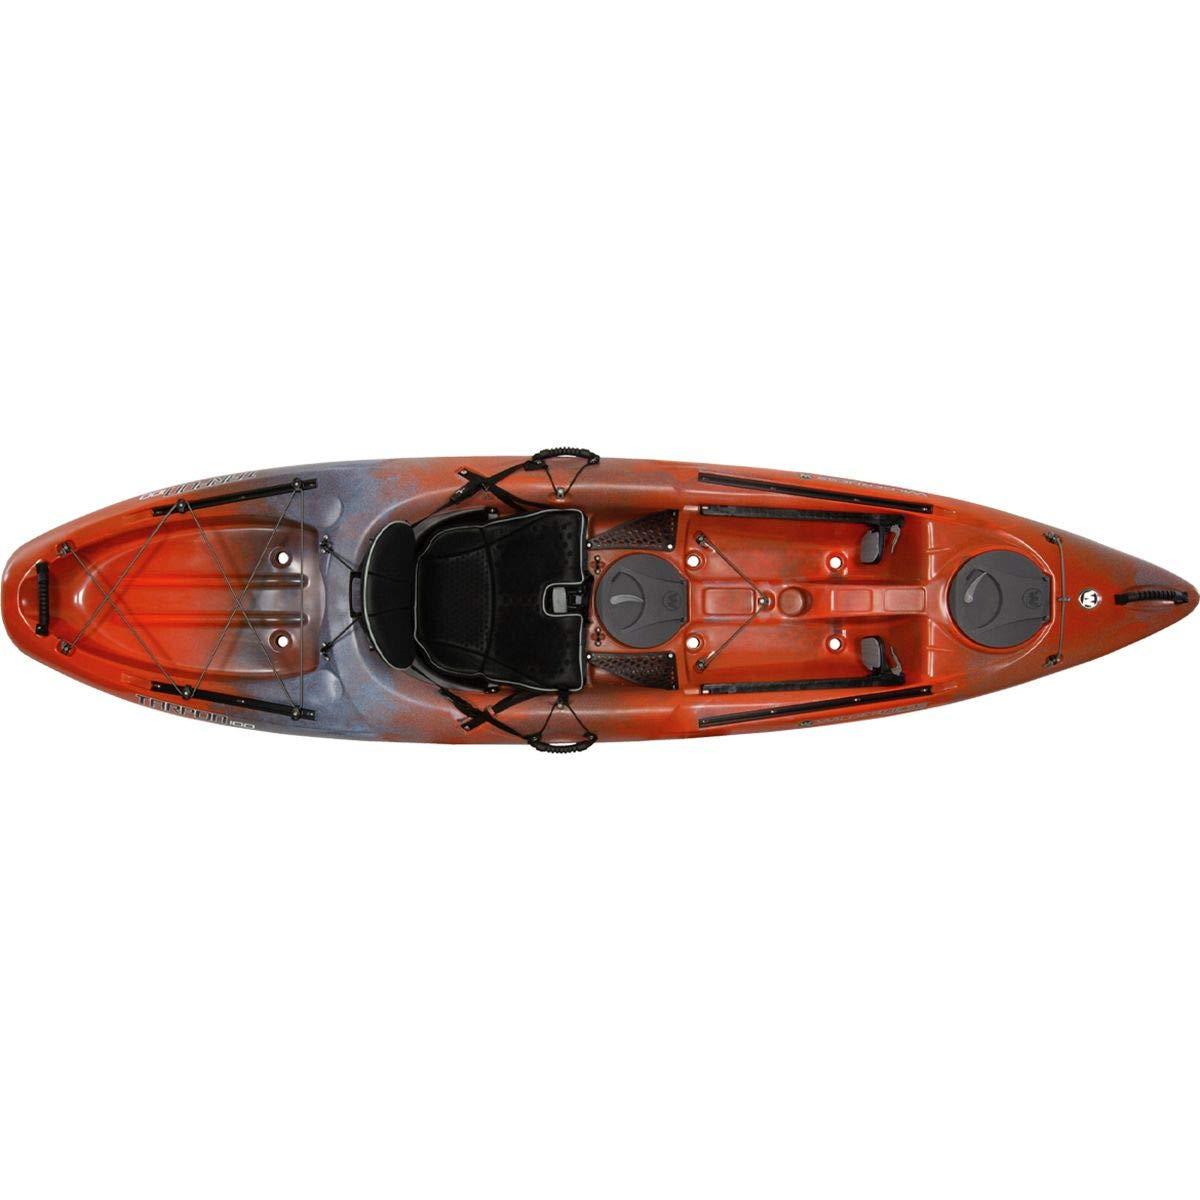 Wilderness Systems Tarpon 100 Angler Kayaka